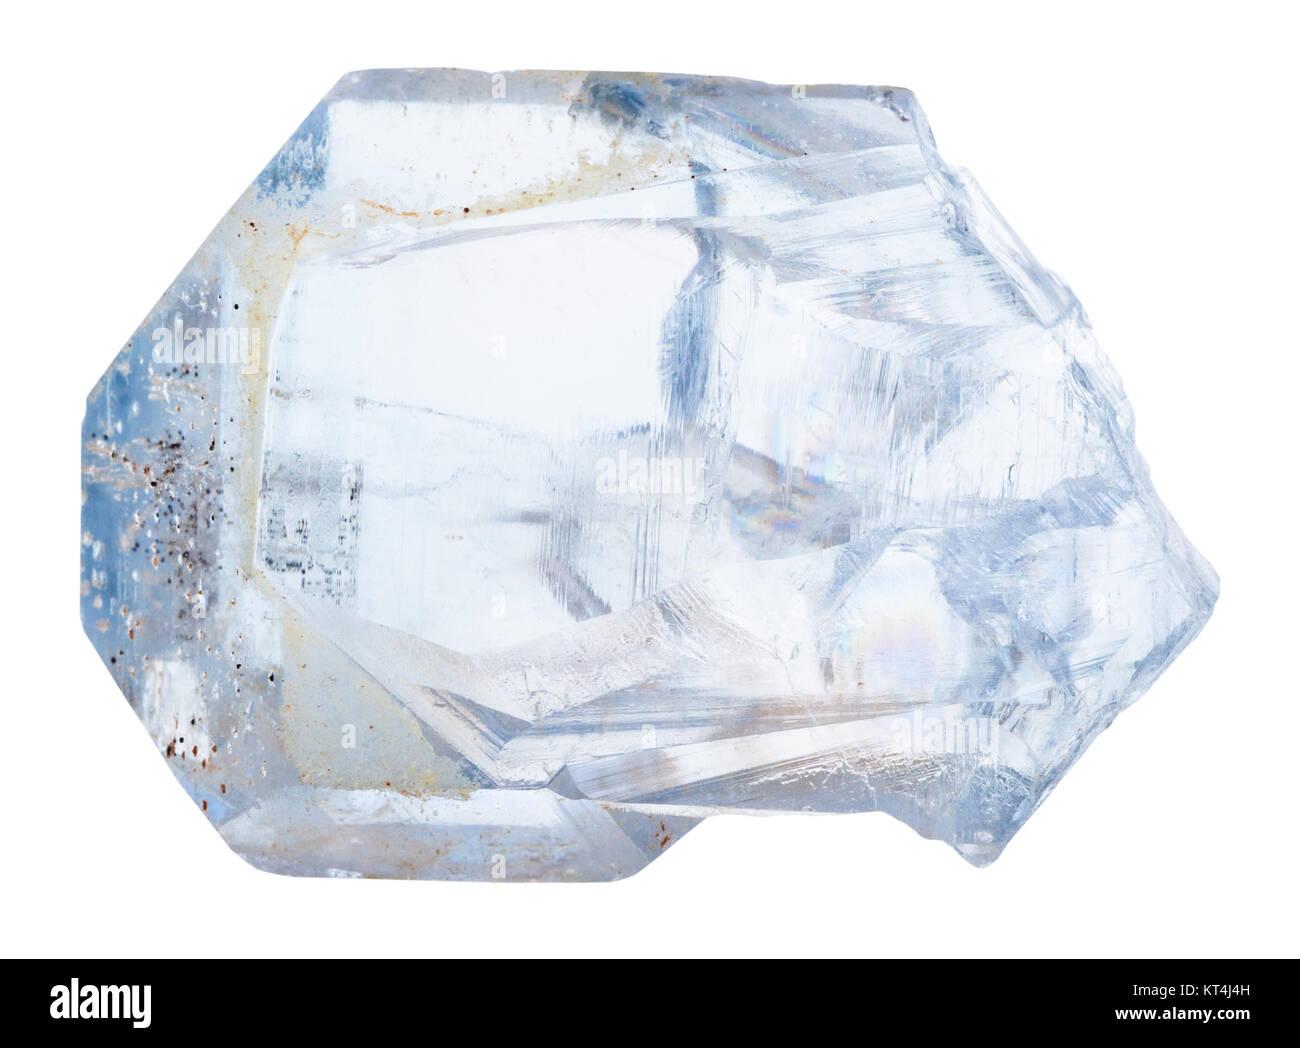 crystal of celestine rock isolated - Stock Image